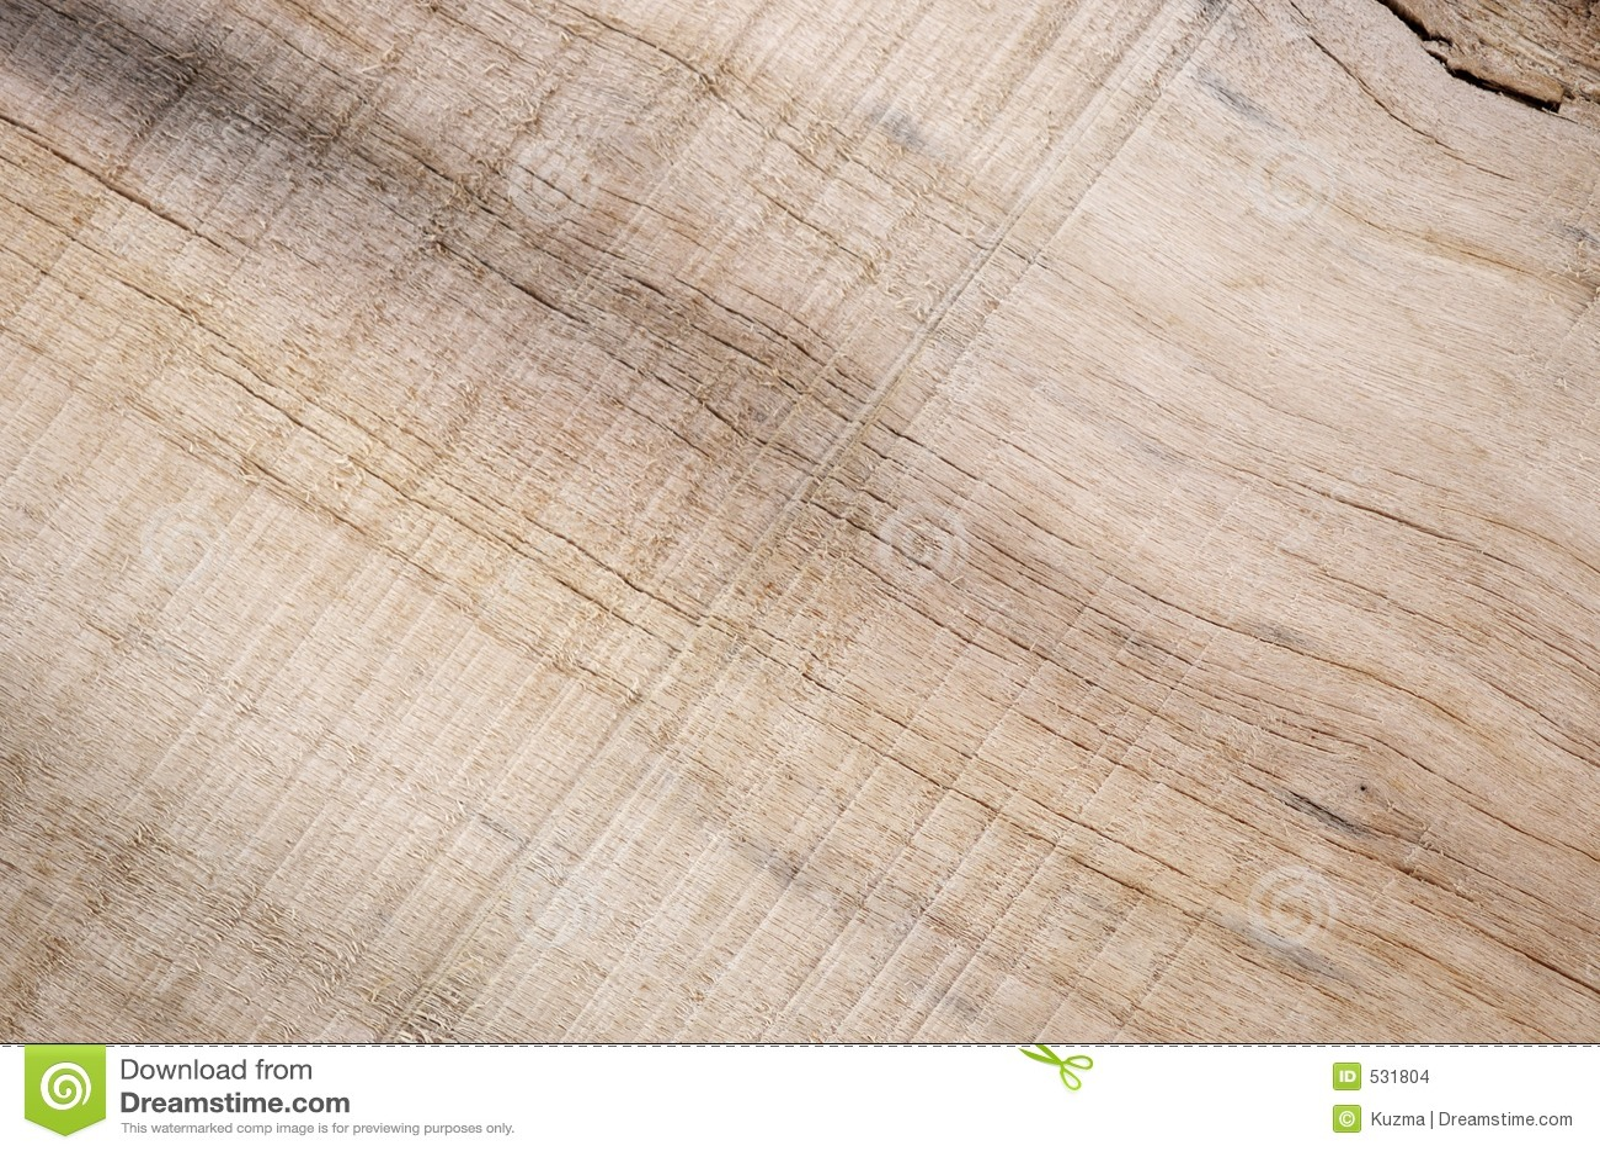 Download 木的背景 库存照片. 图片 包括有 表面, 纹理, 发票, 打印, 参差不齐, 裂缝, 森林, 结构树, 配置文件 - 531804